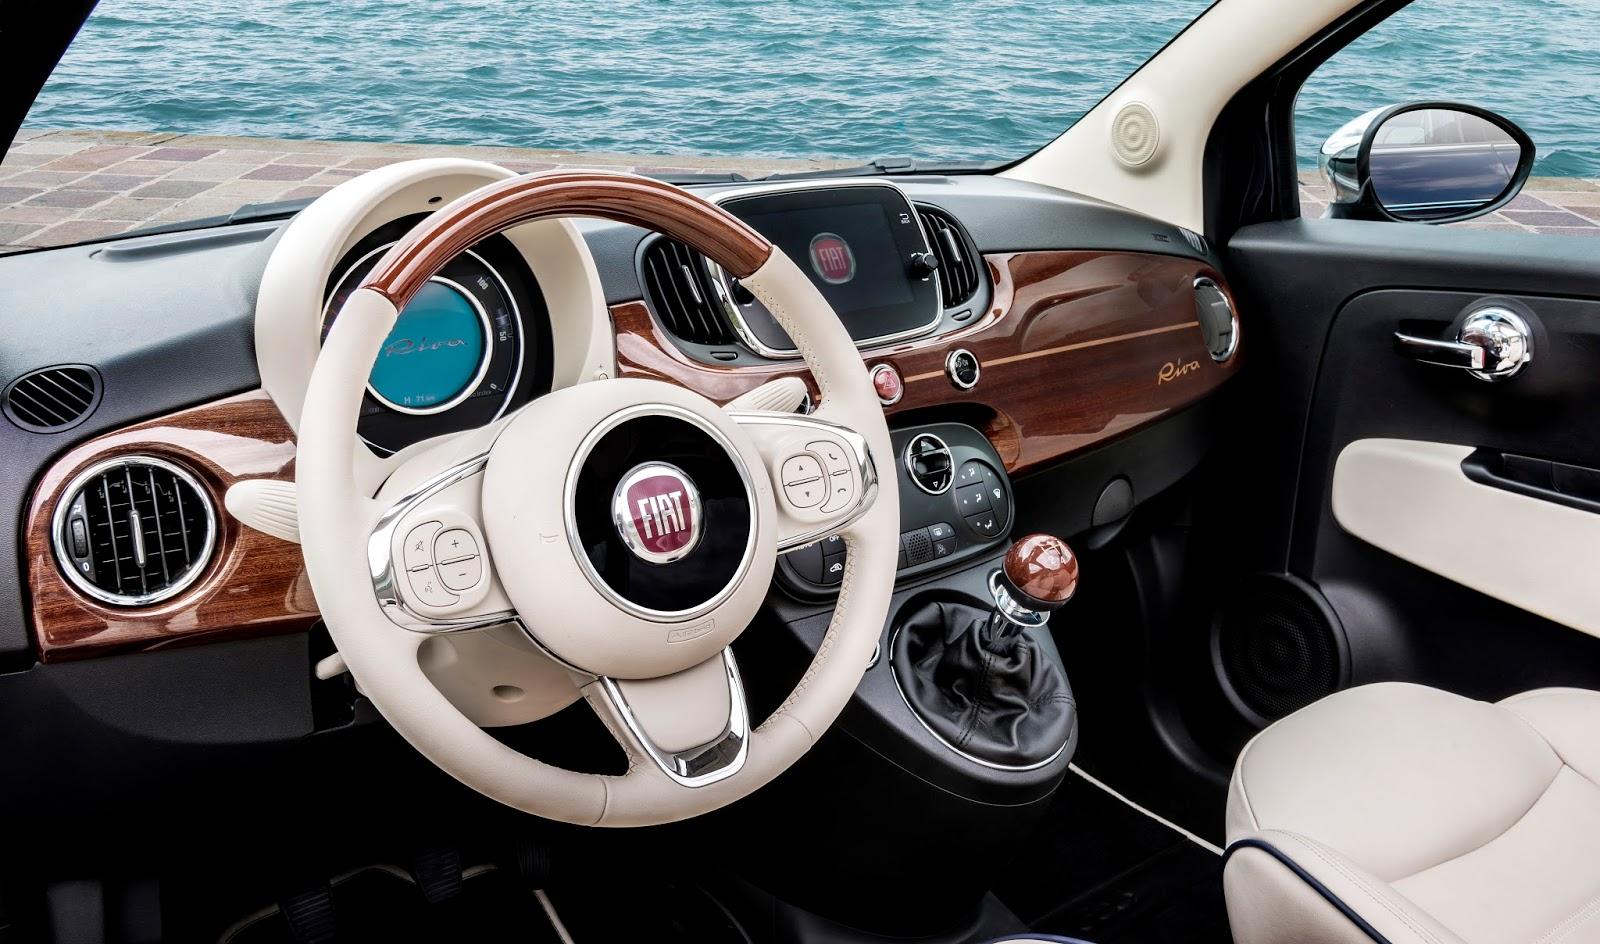 160627 Fiat 500 Riva 17 Fiat 500 Riva : Το κομψό έγινε και πολυτελές Fiat, Fiat 500, Fiat 500 Riva, Fiat 500C, Riva, supermini, videos